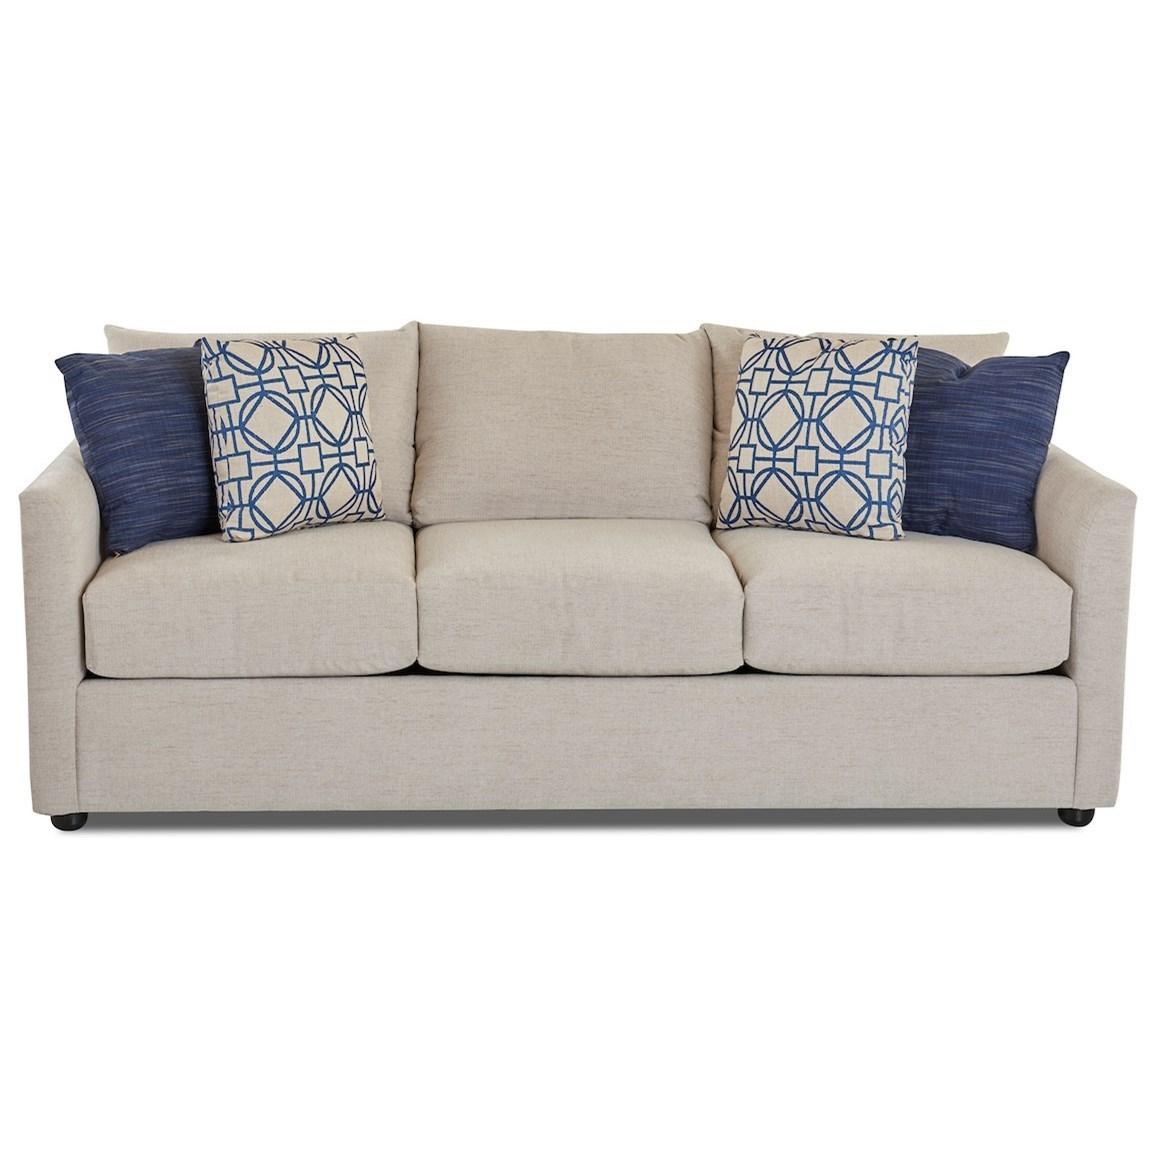 Atlanta Sleeper Sofa w/ Innerspring Mattress by Klaussner at Johnny Janosik